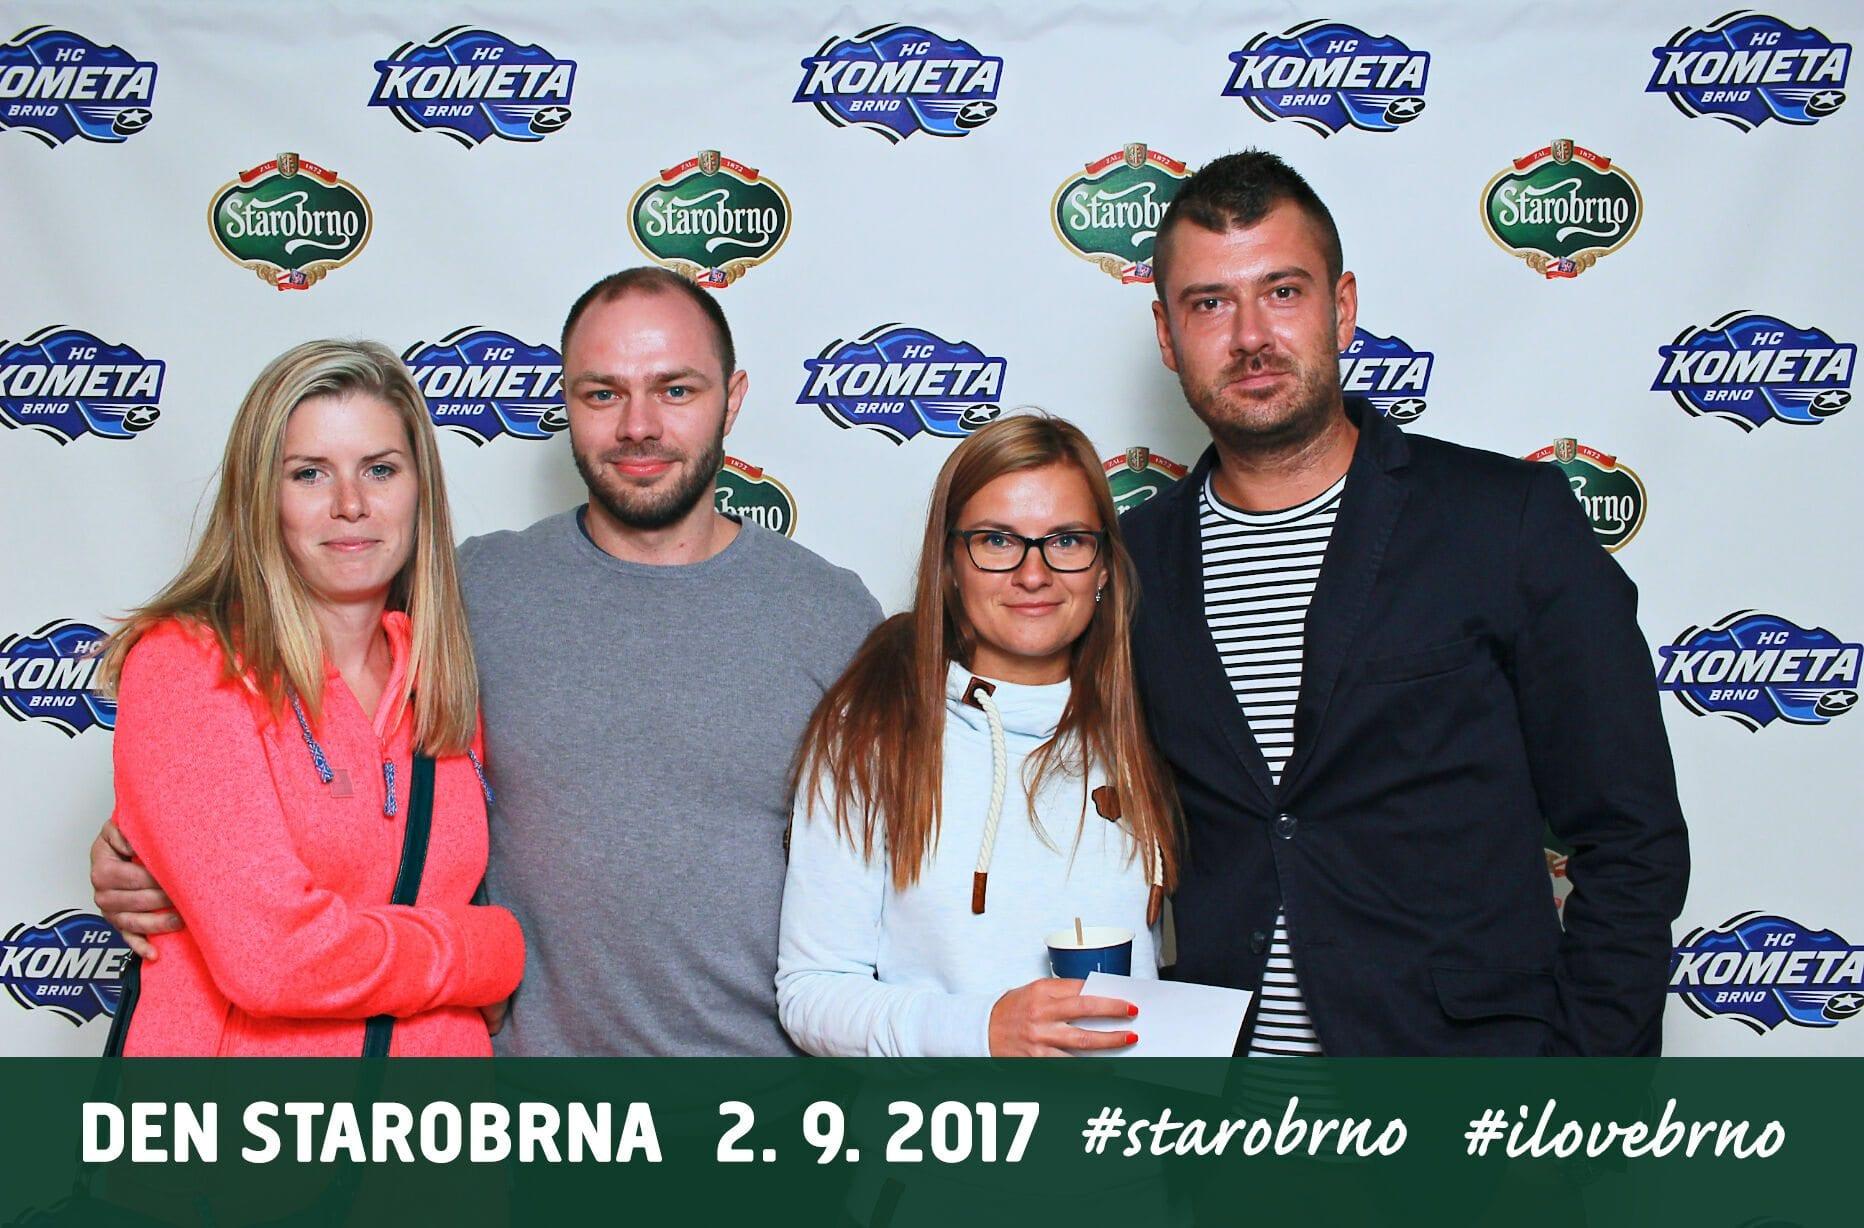 fotokoutek-starobrno-2-9-2017-304438